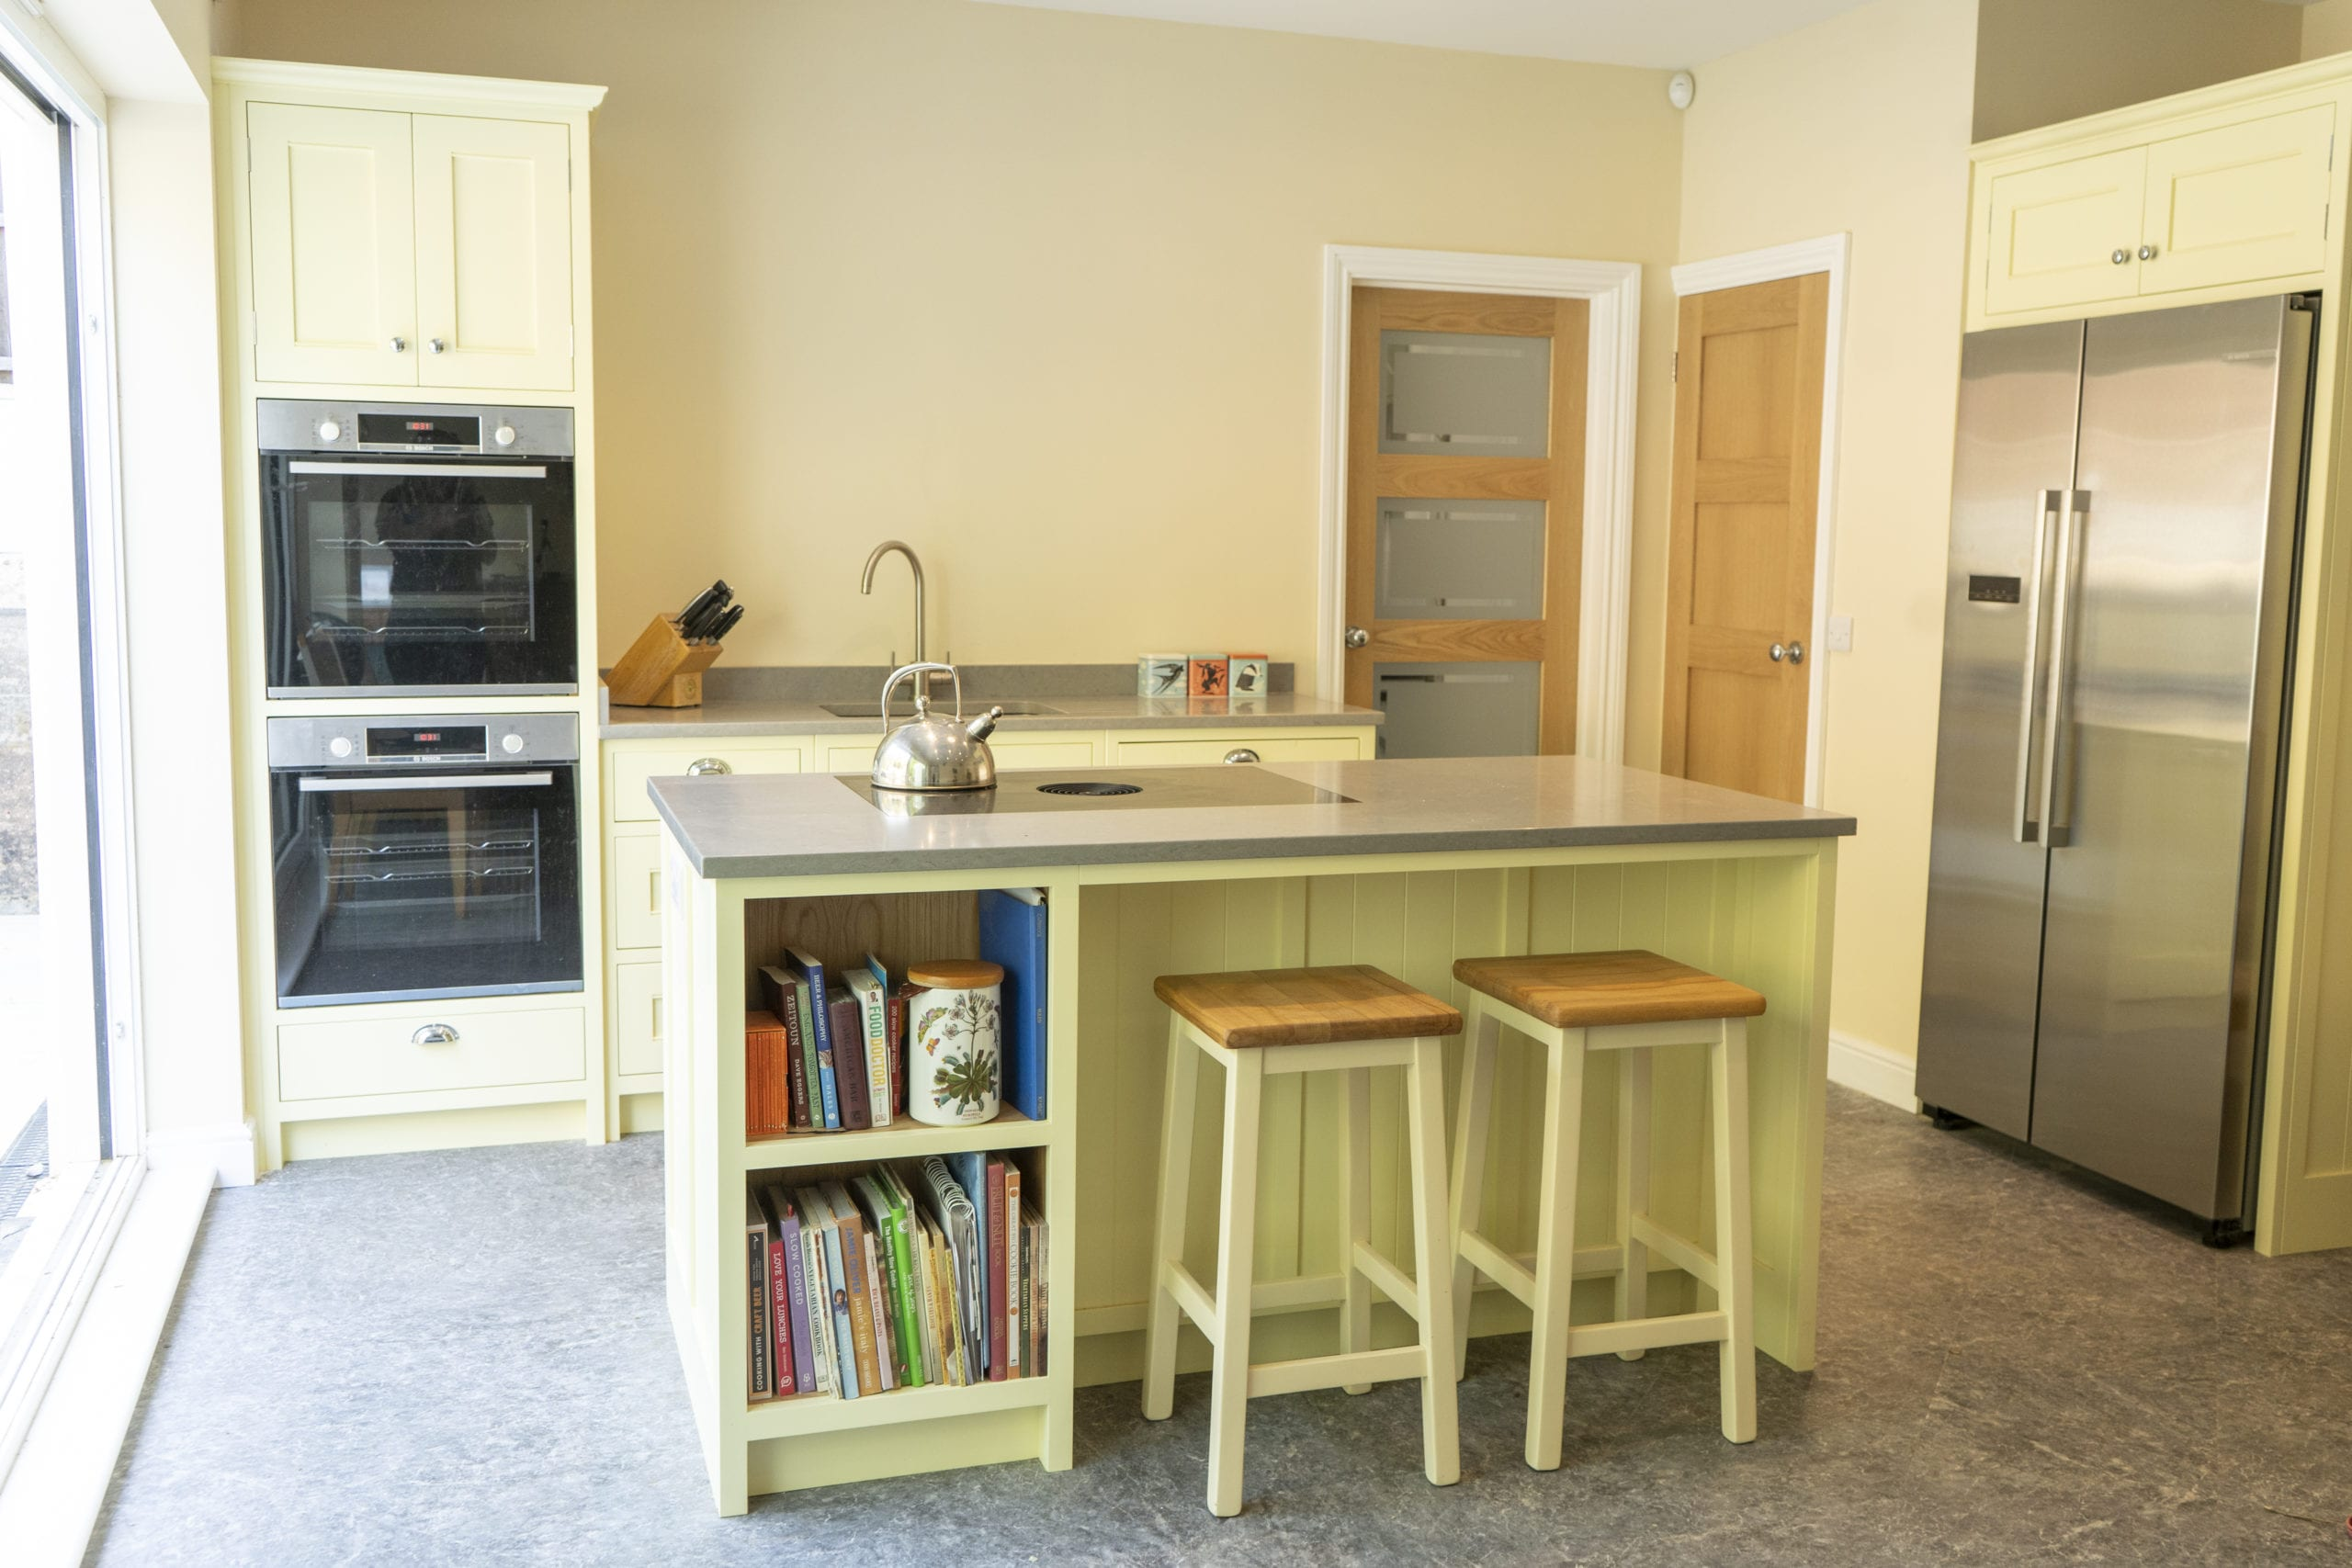 Bedfordshire Yellow Shaker Kitchen